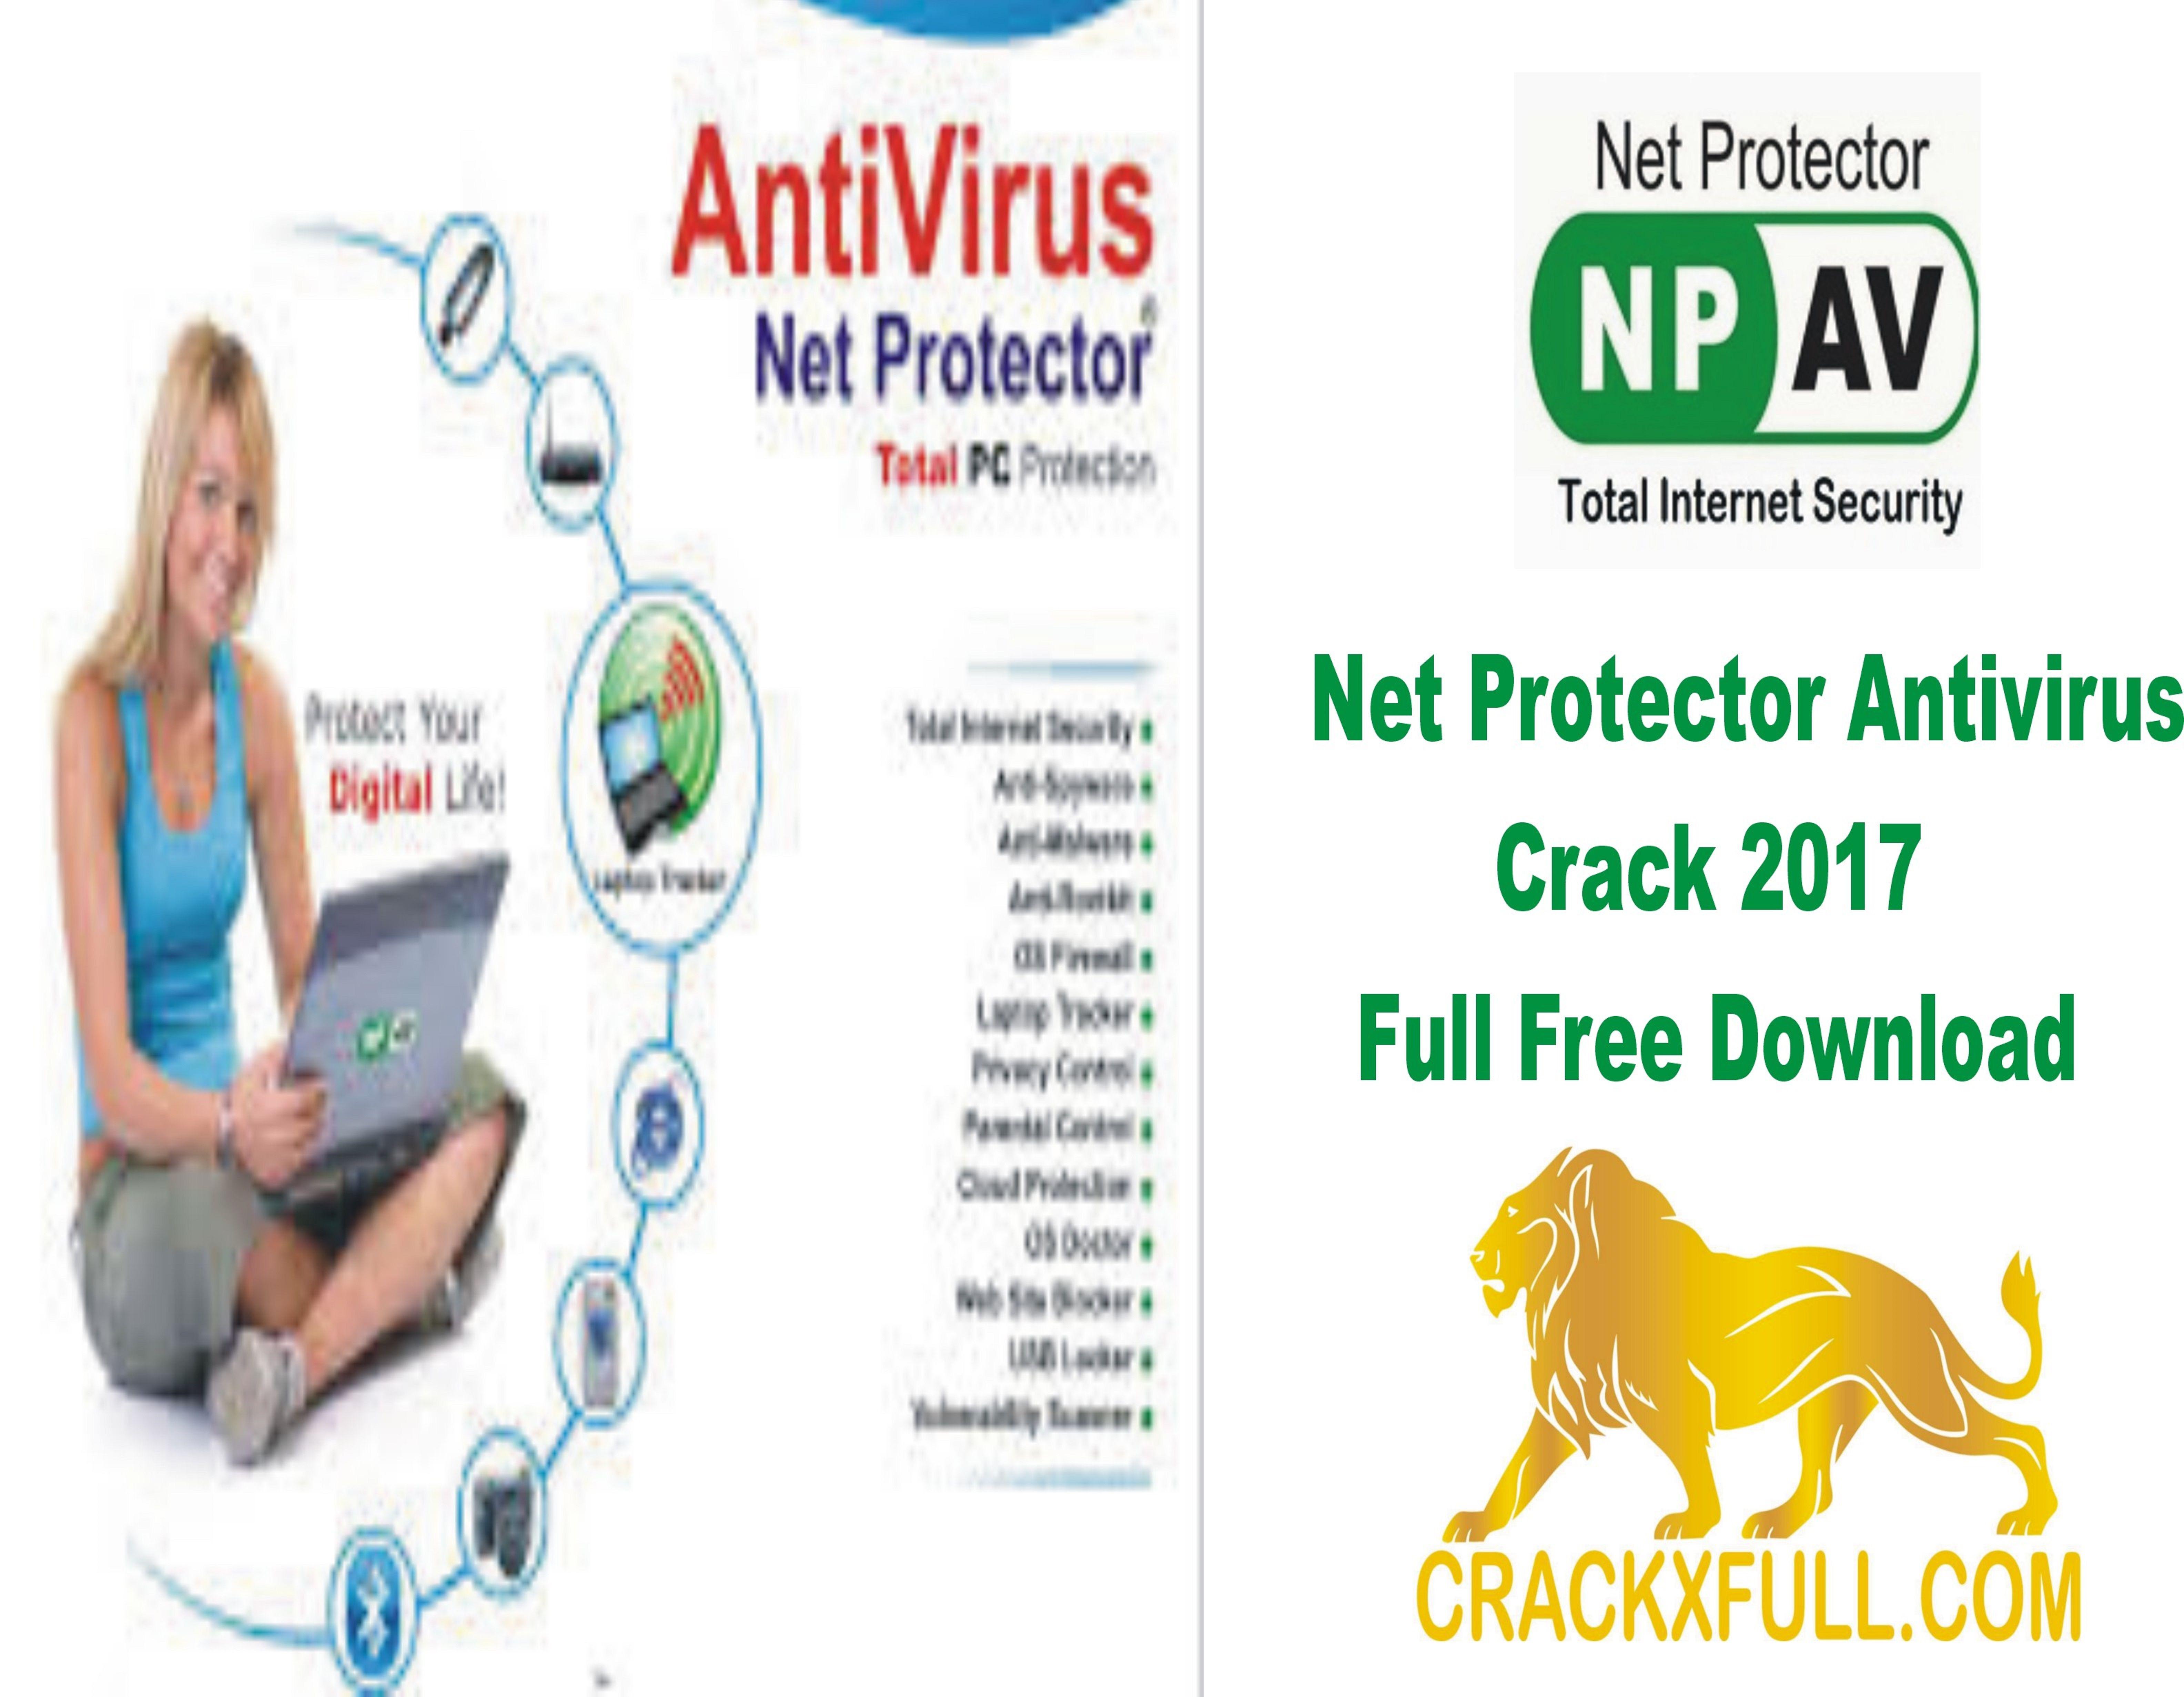 npav crack version download for pc